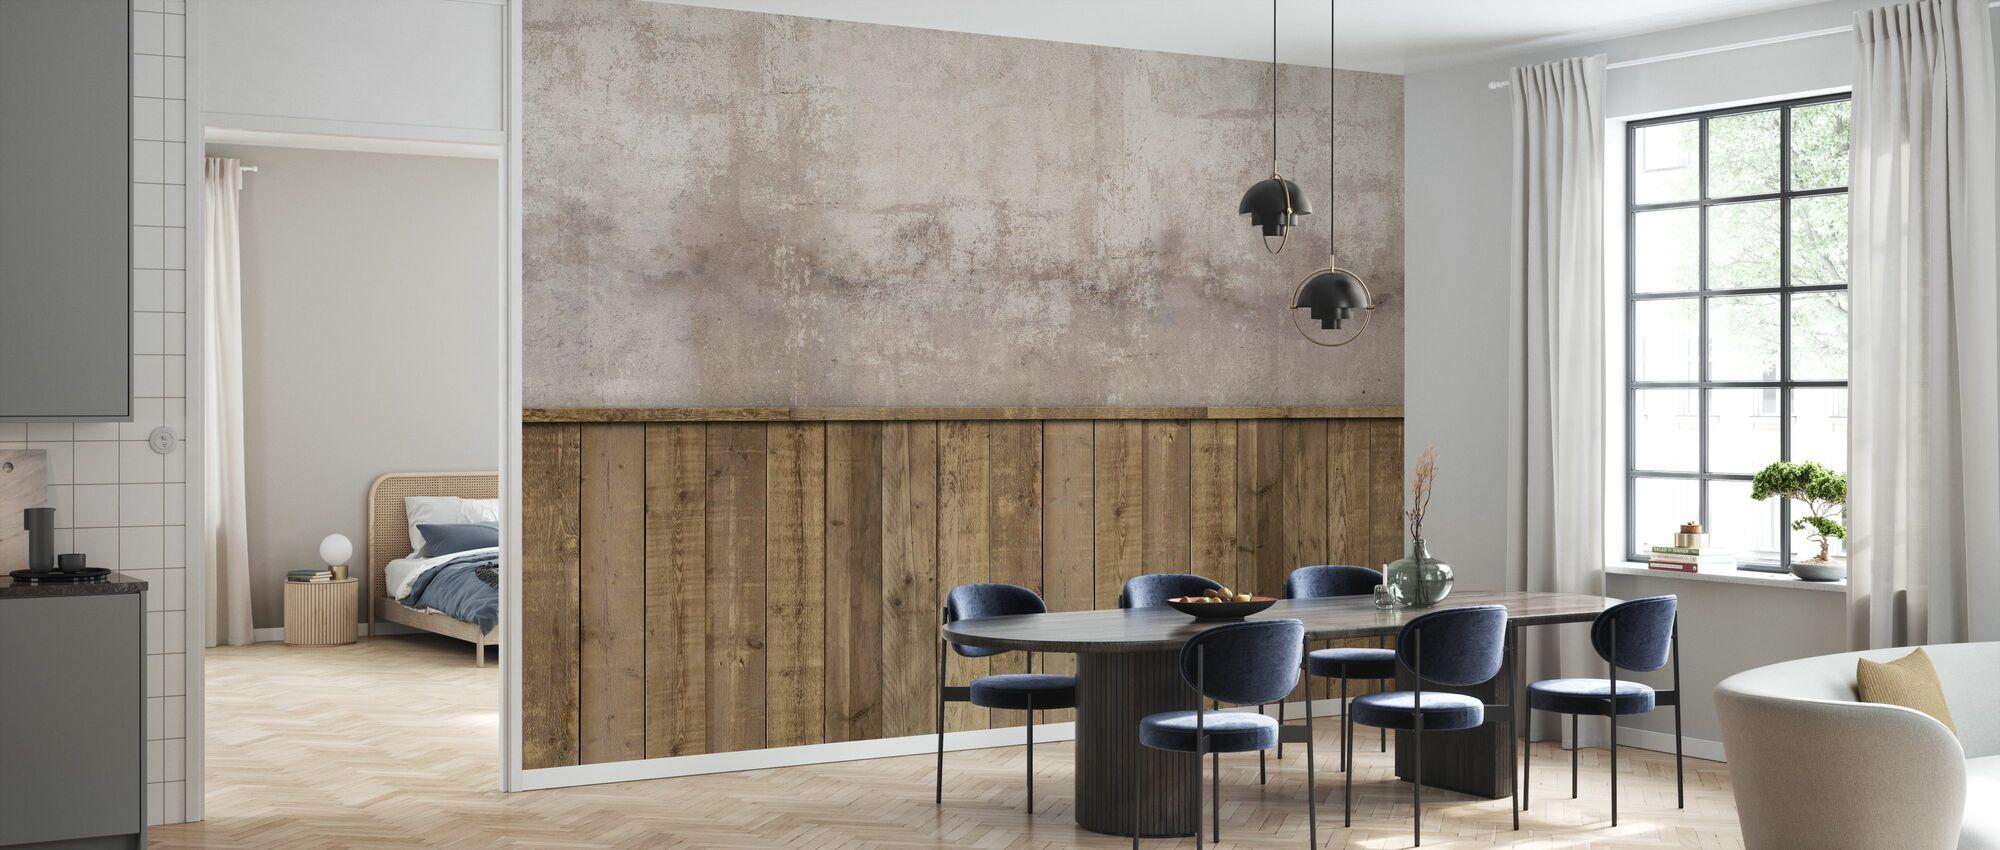 Rough Store Wall II - Tapete - Küchen